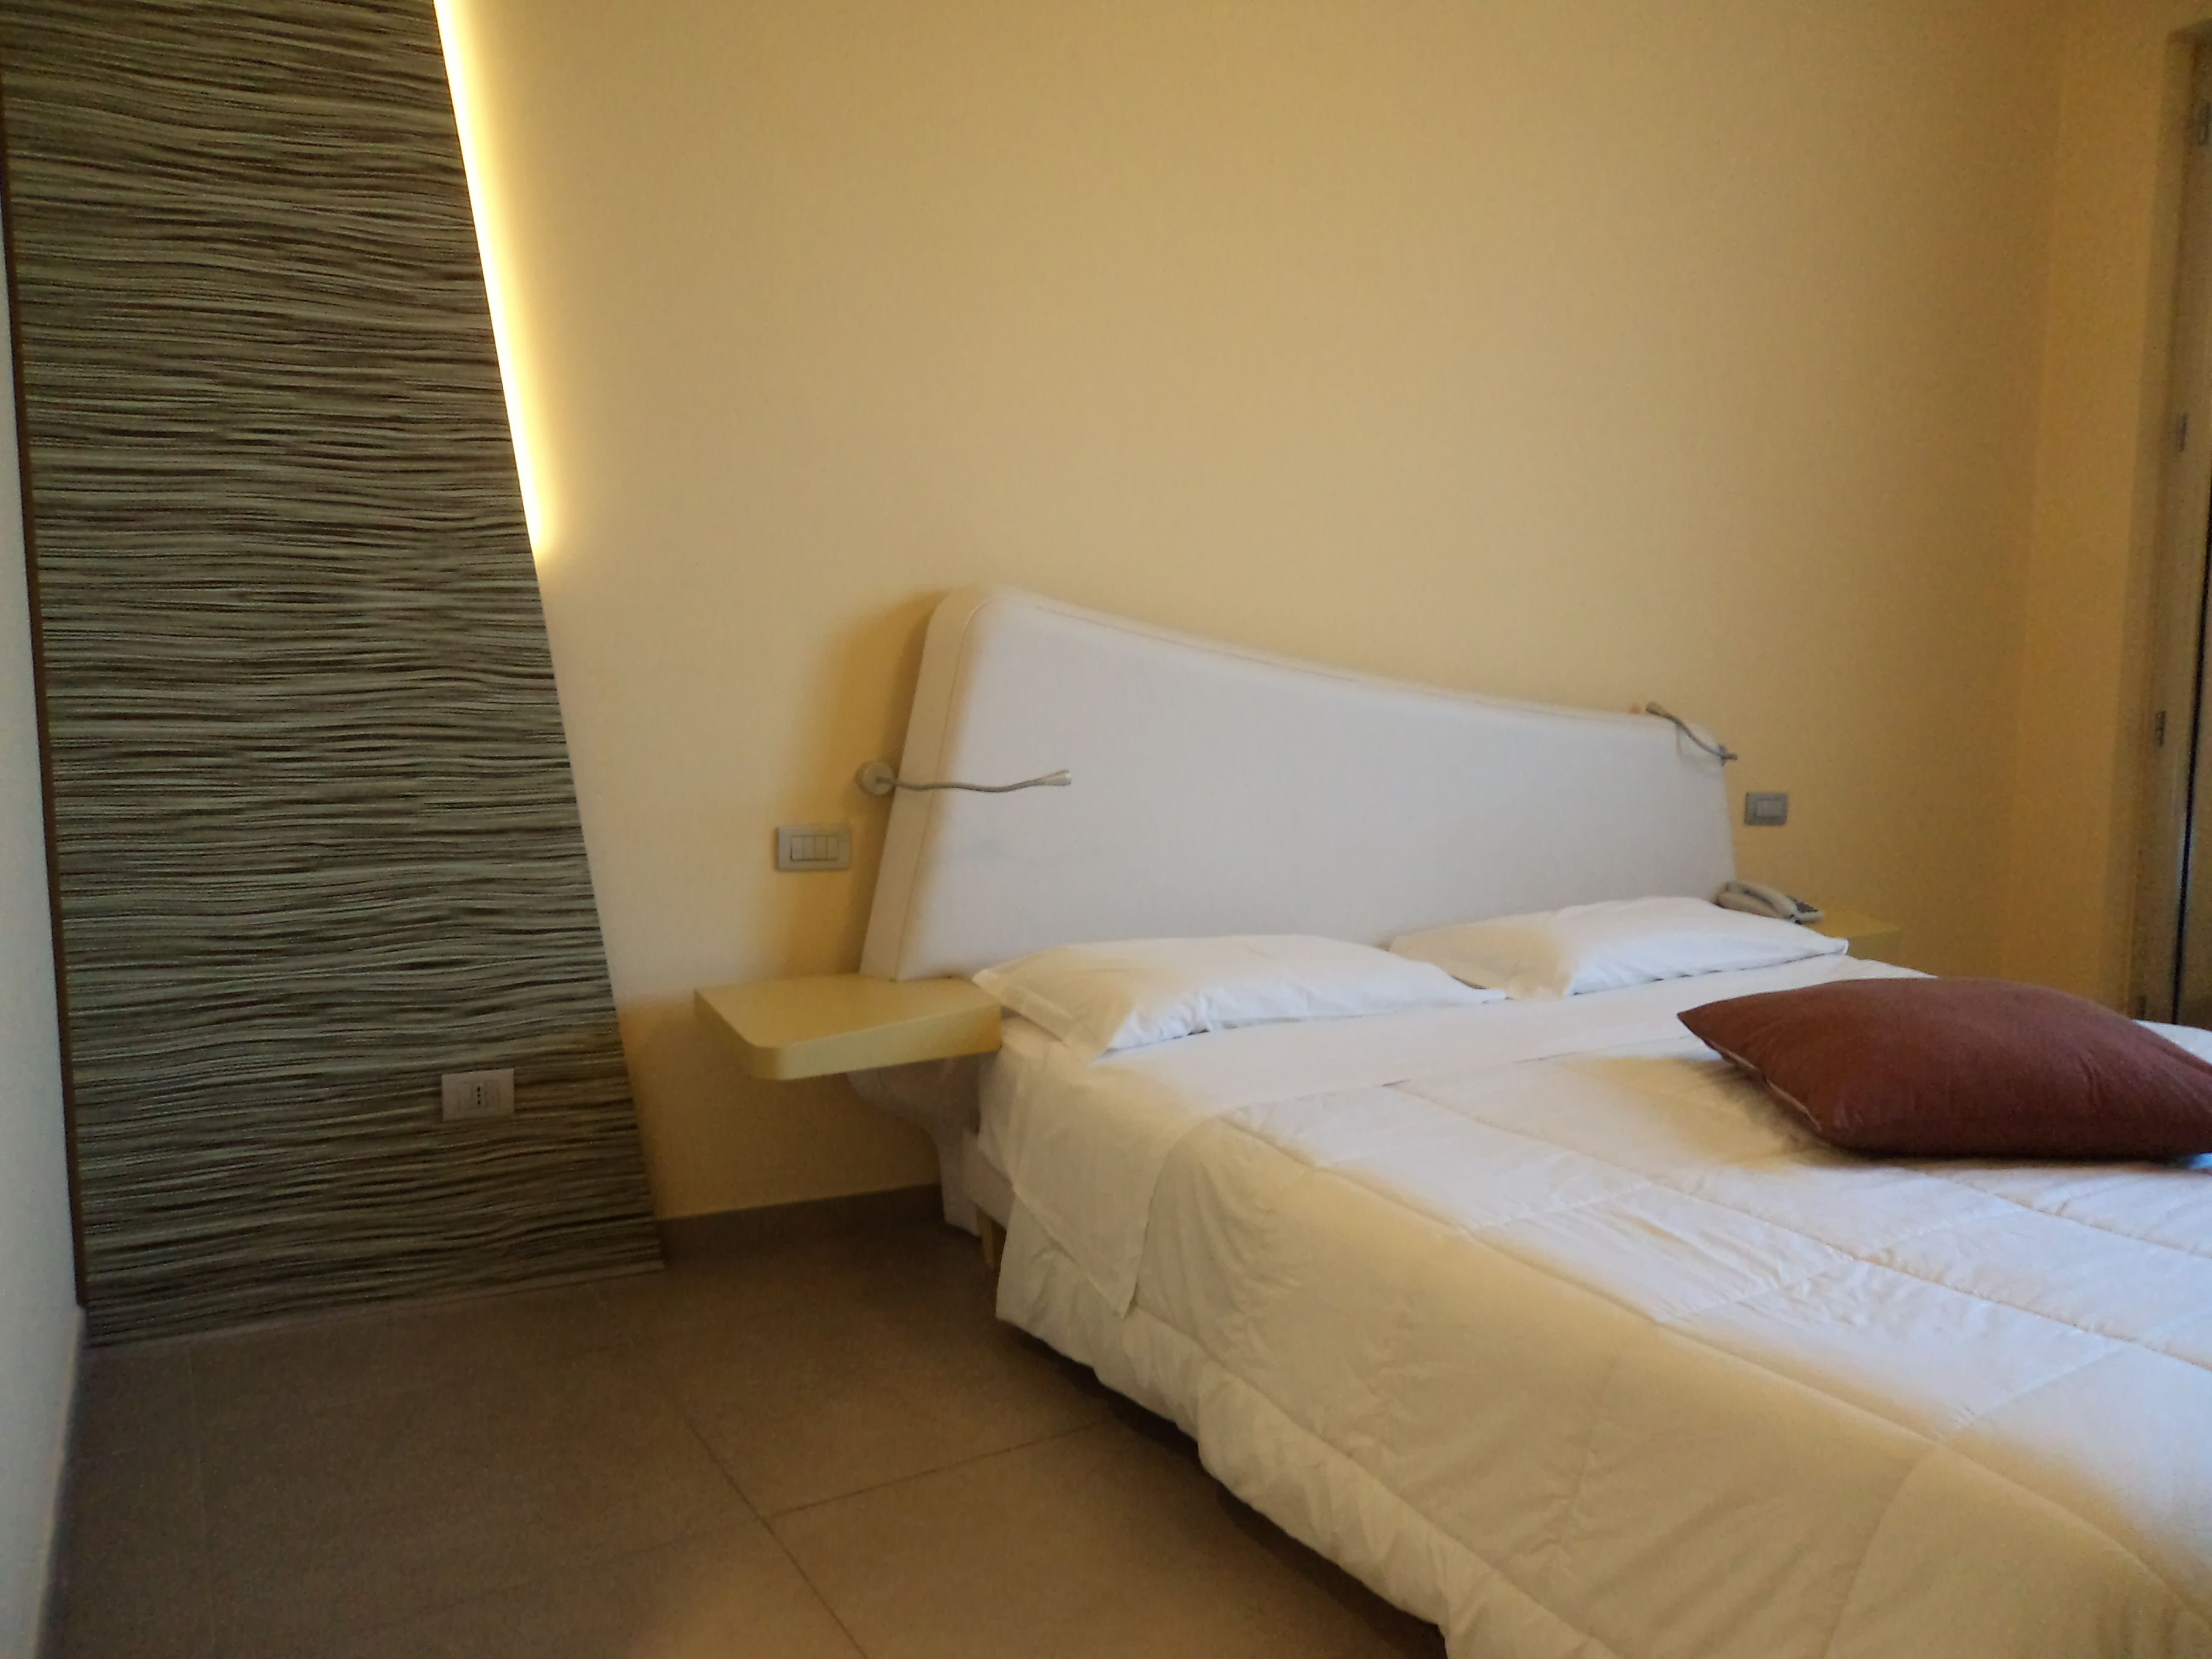 Double Room. #acireale #hotel #Etnacoast #Etna #design #Catania #ibisstylescatania #happymood #ibis #hotel #hotelroom